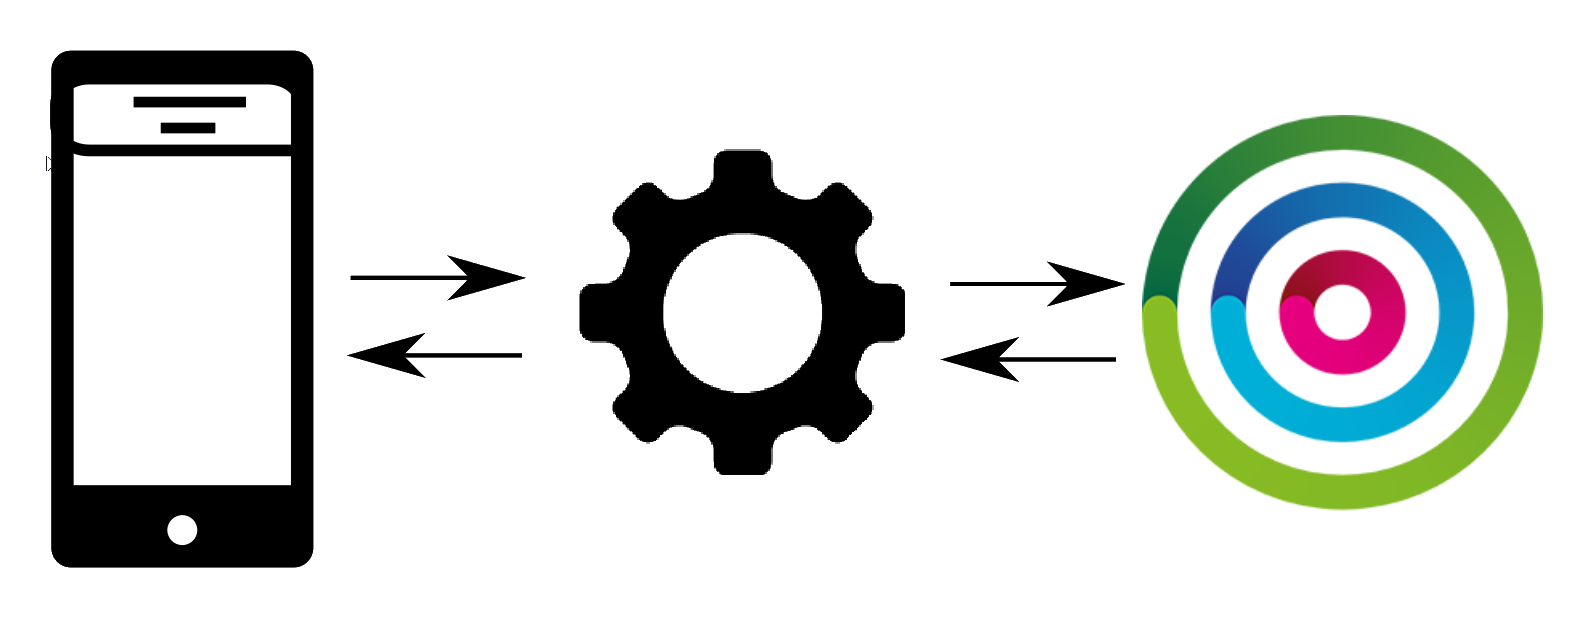 JS framework sending the registration ID between Engagement Cloud and your app